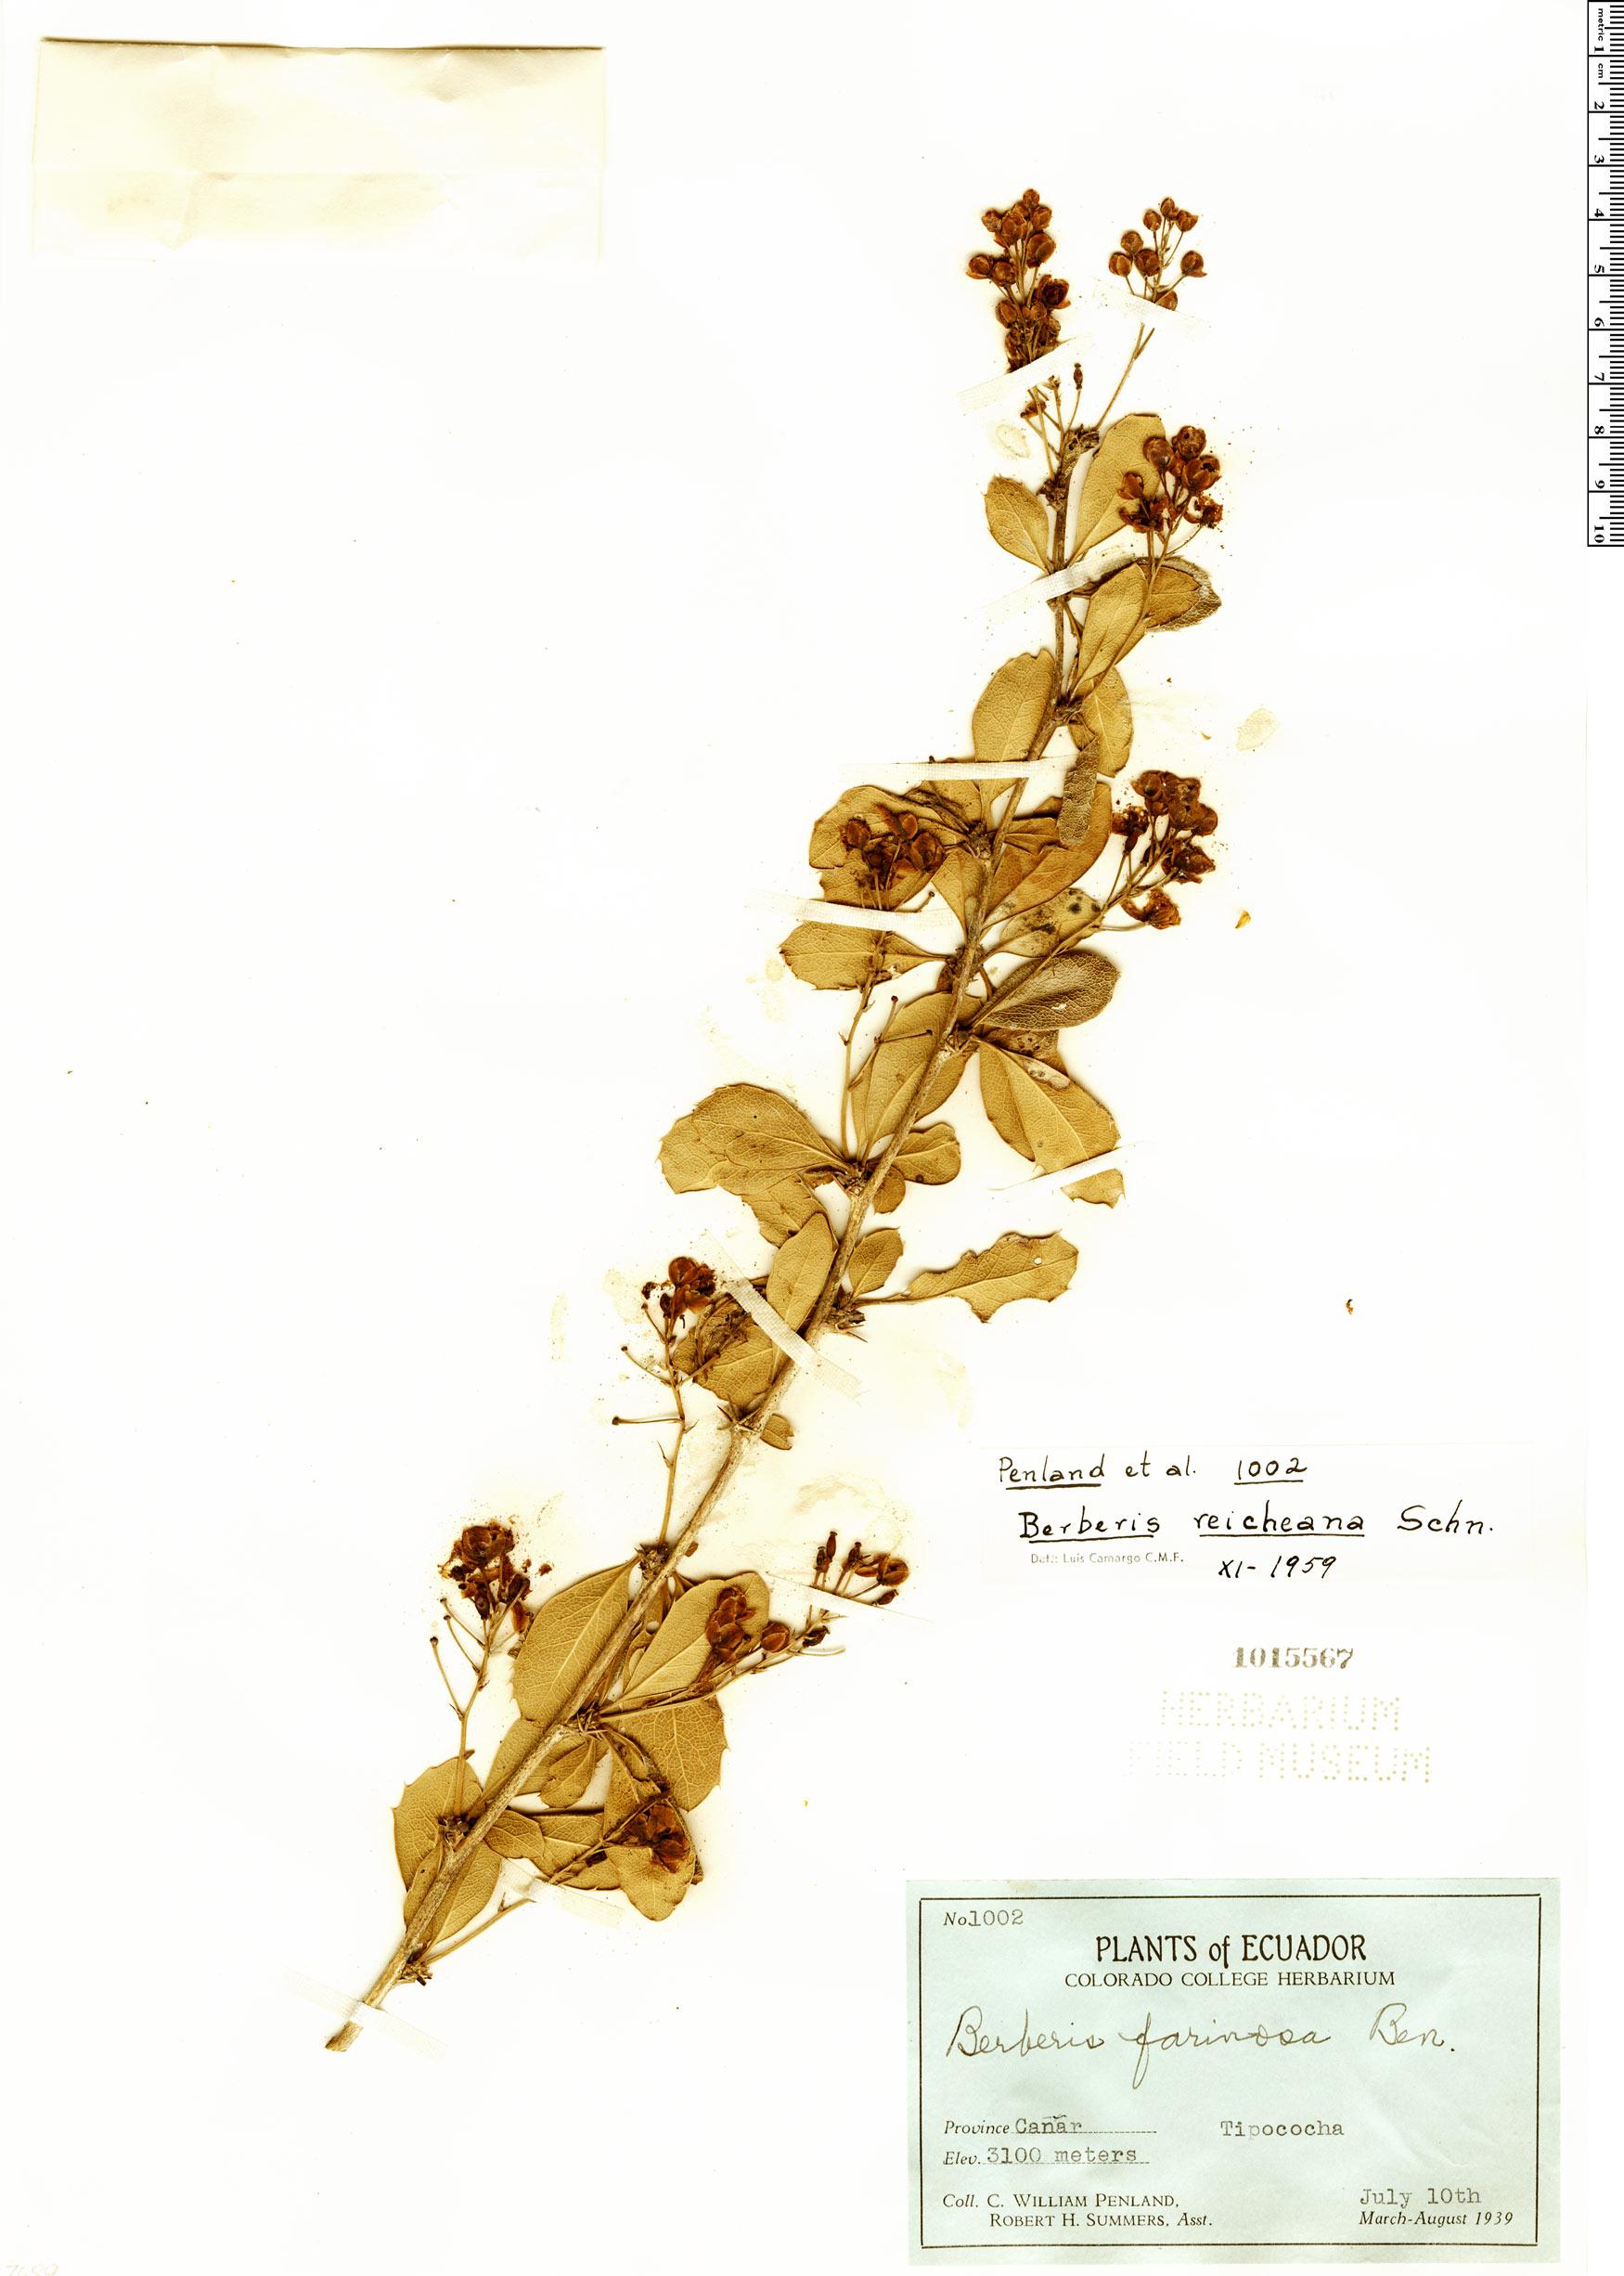 Specimen: Berberis reicheana